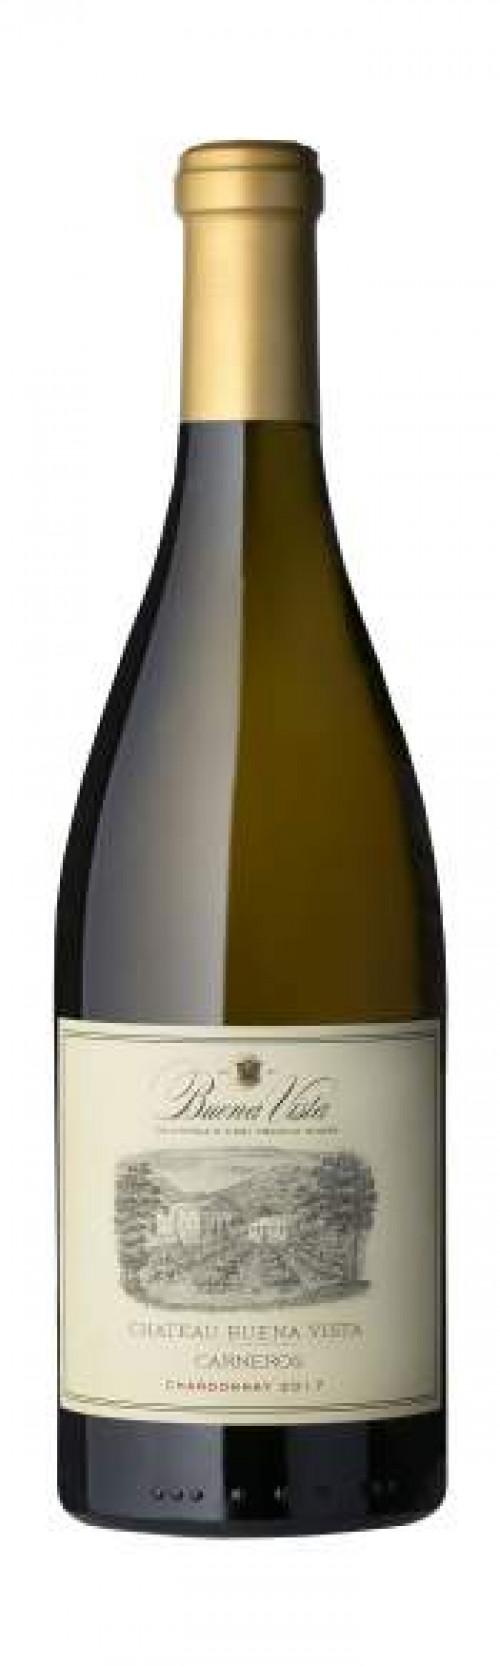 2019 Buena Vista Chateau Buena Vista Carneros Chardonnay 750ml